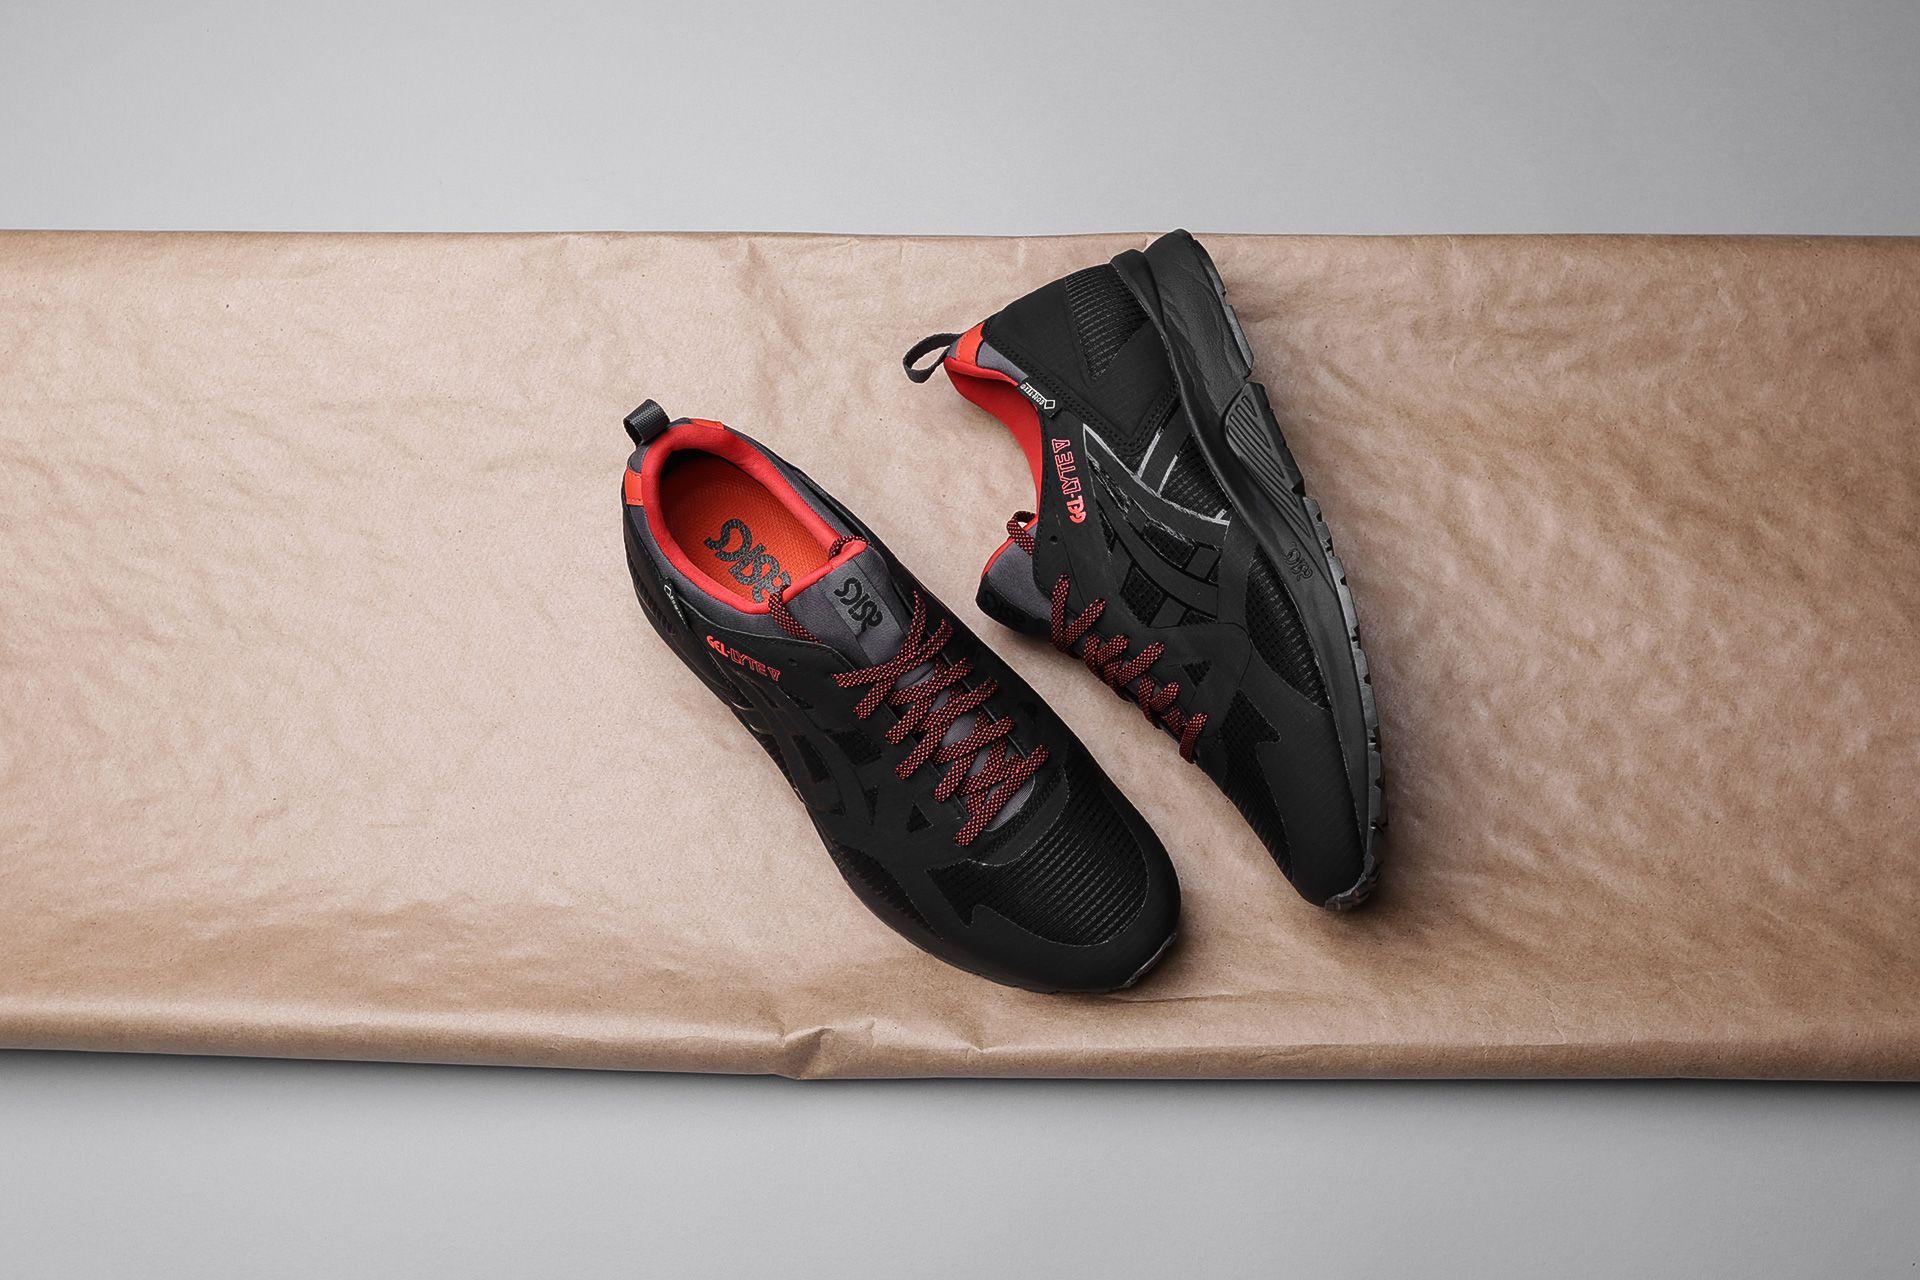 new arrival ddbf2 abc9a Купить черные мужские кроссовки Gel-Lyte V NS G-TX от ASICS ...